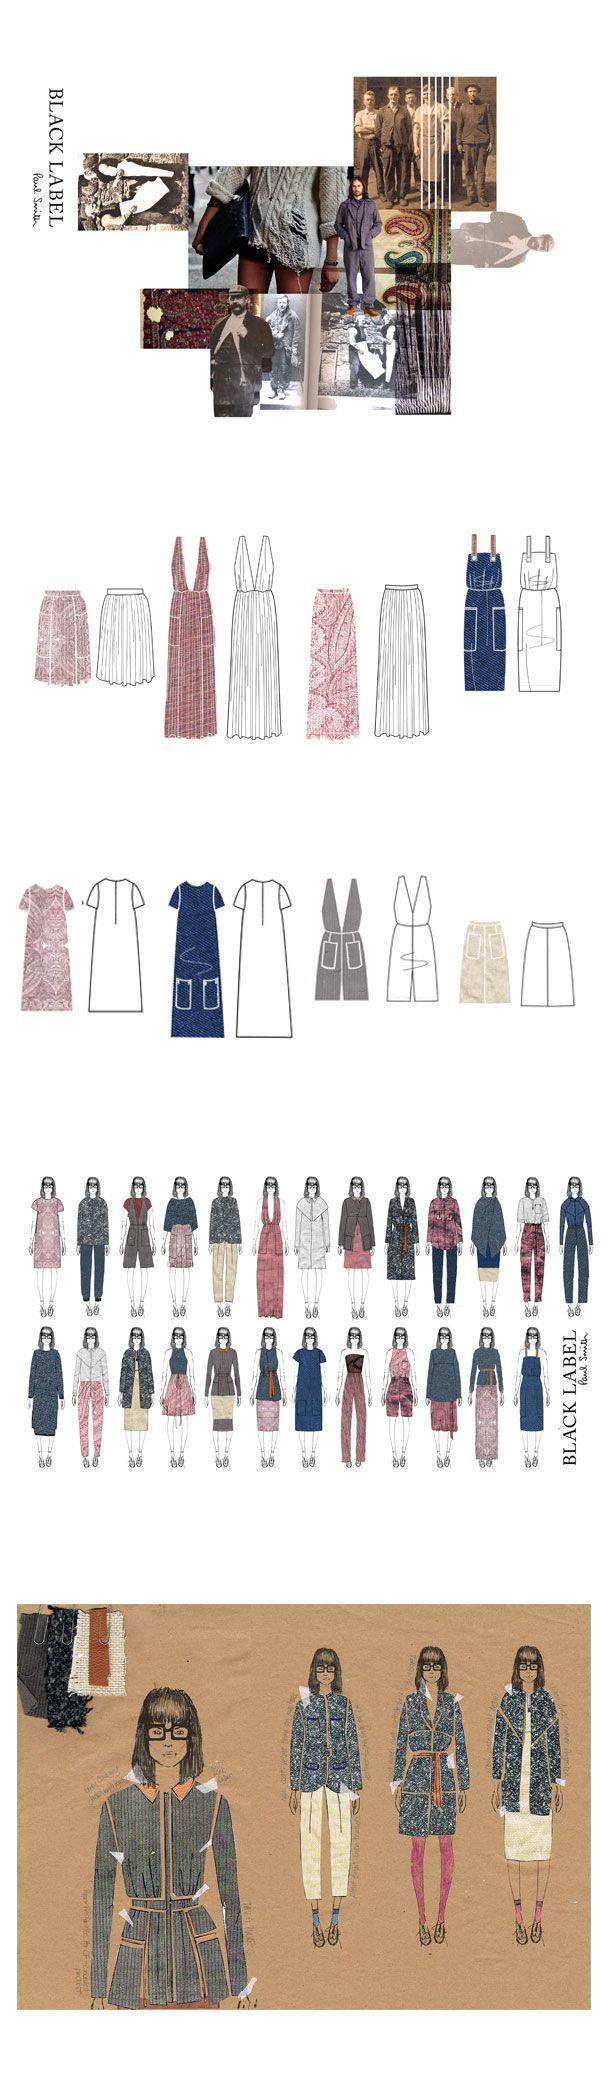 Fashion Sketchbook - Paul Smith design project inspired by historical British paisley prints - fashion design development; fashion portfolio // Phoebe Baker